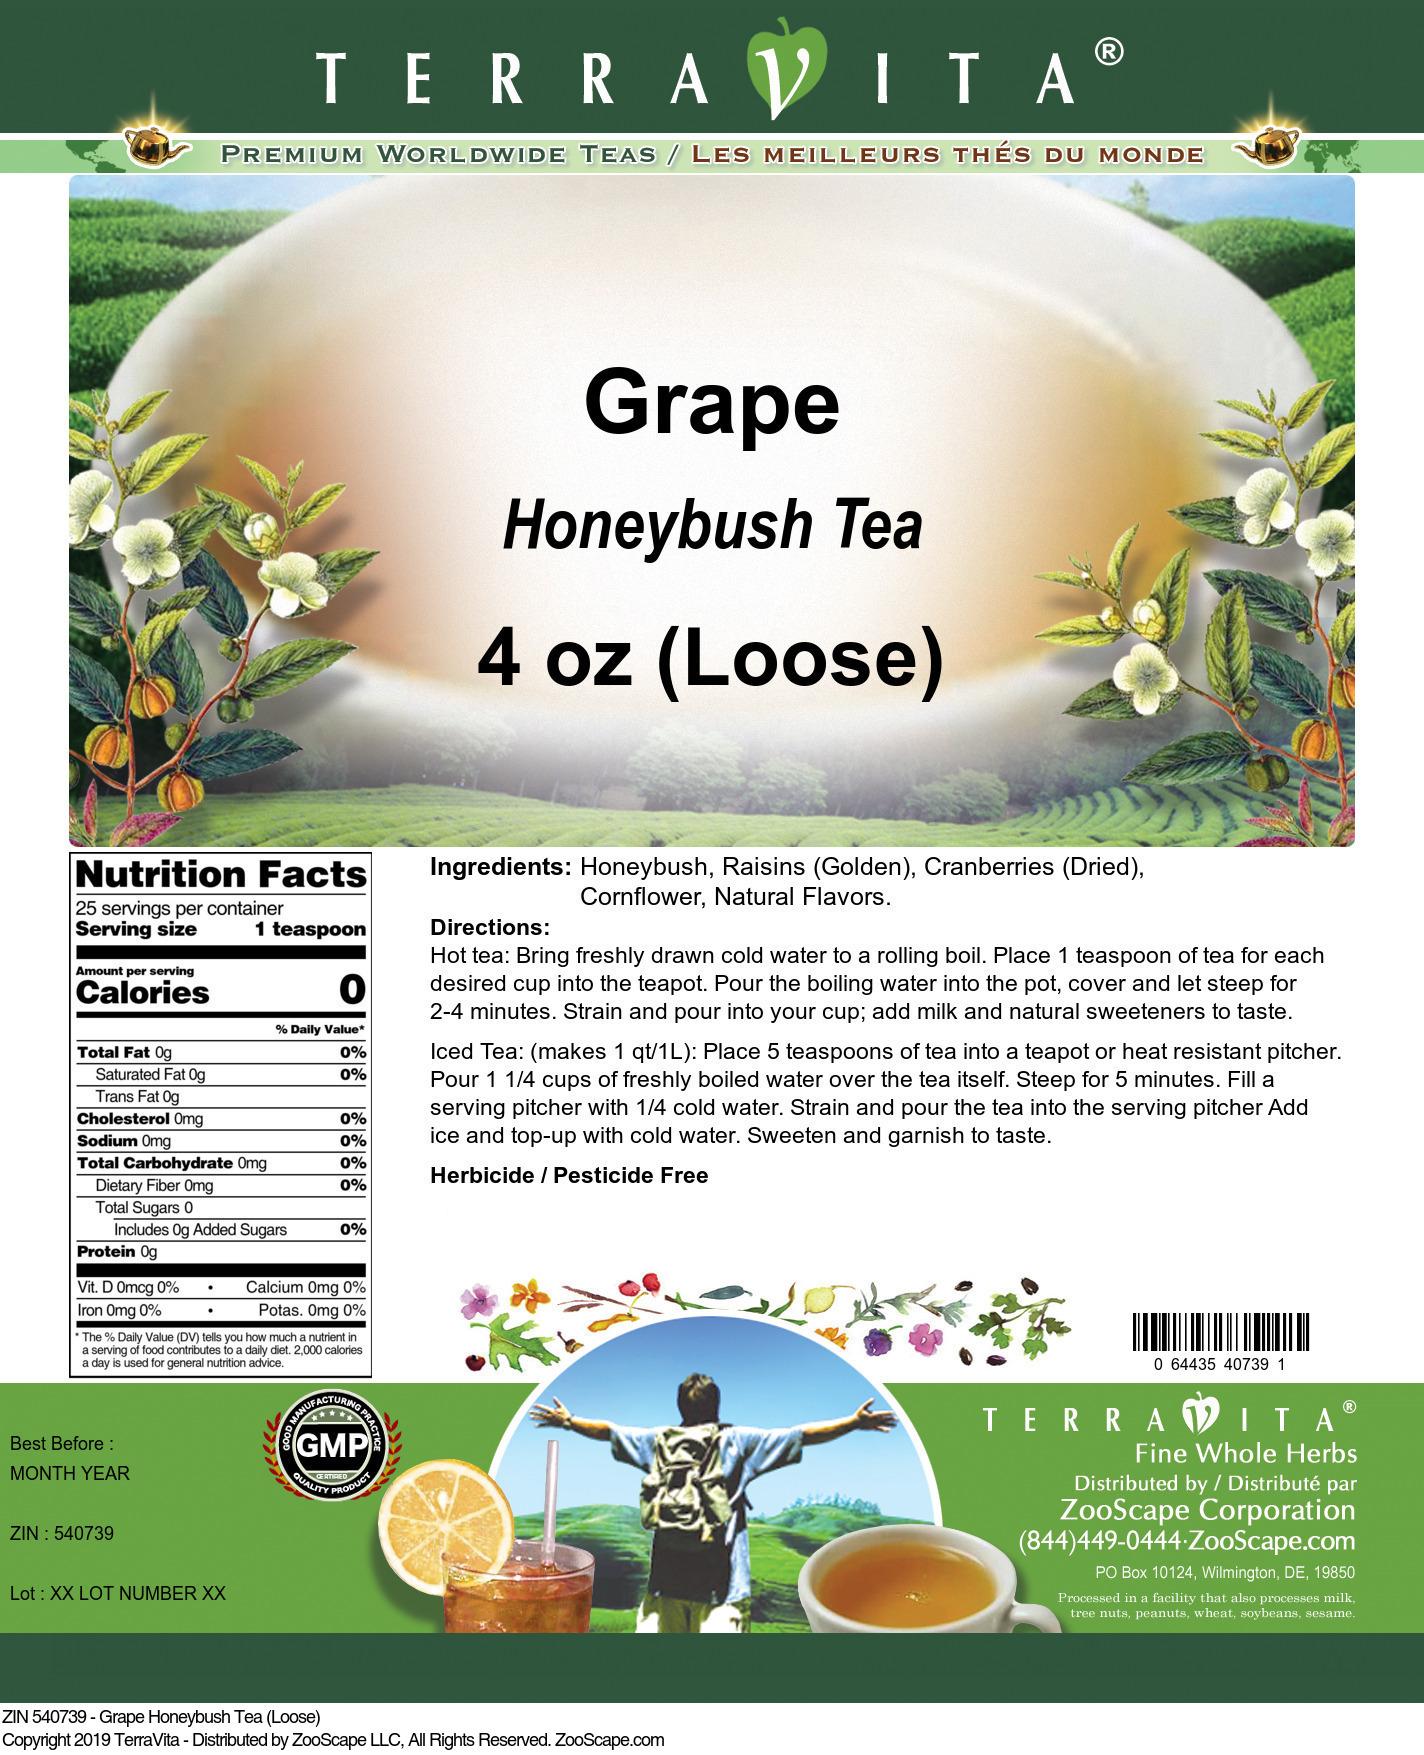 Grape Honeybush Tea